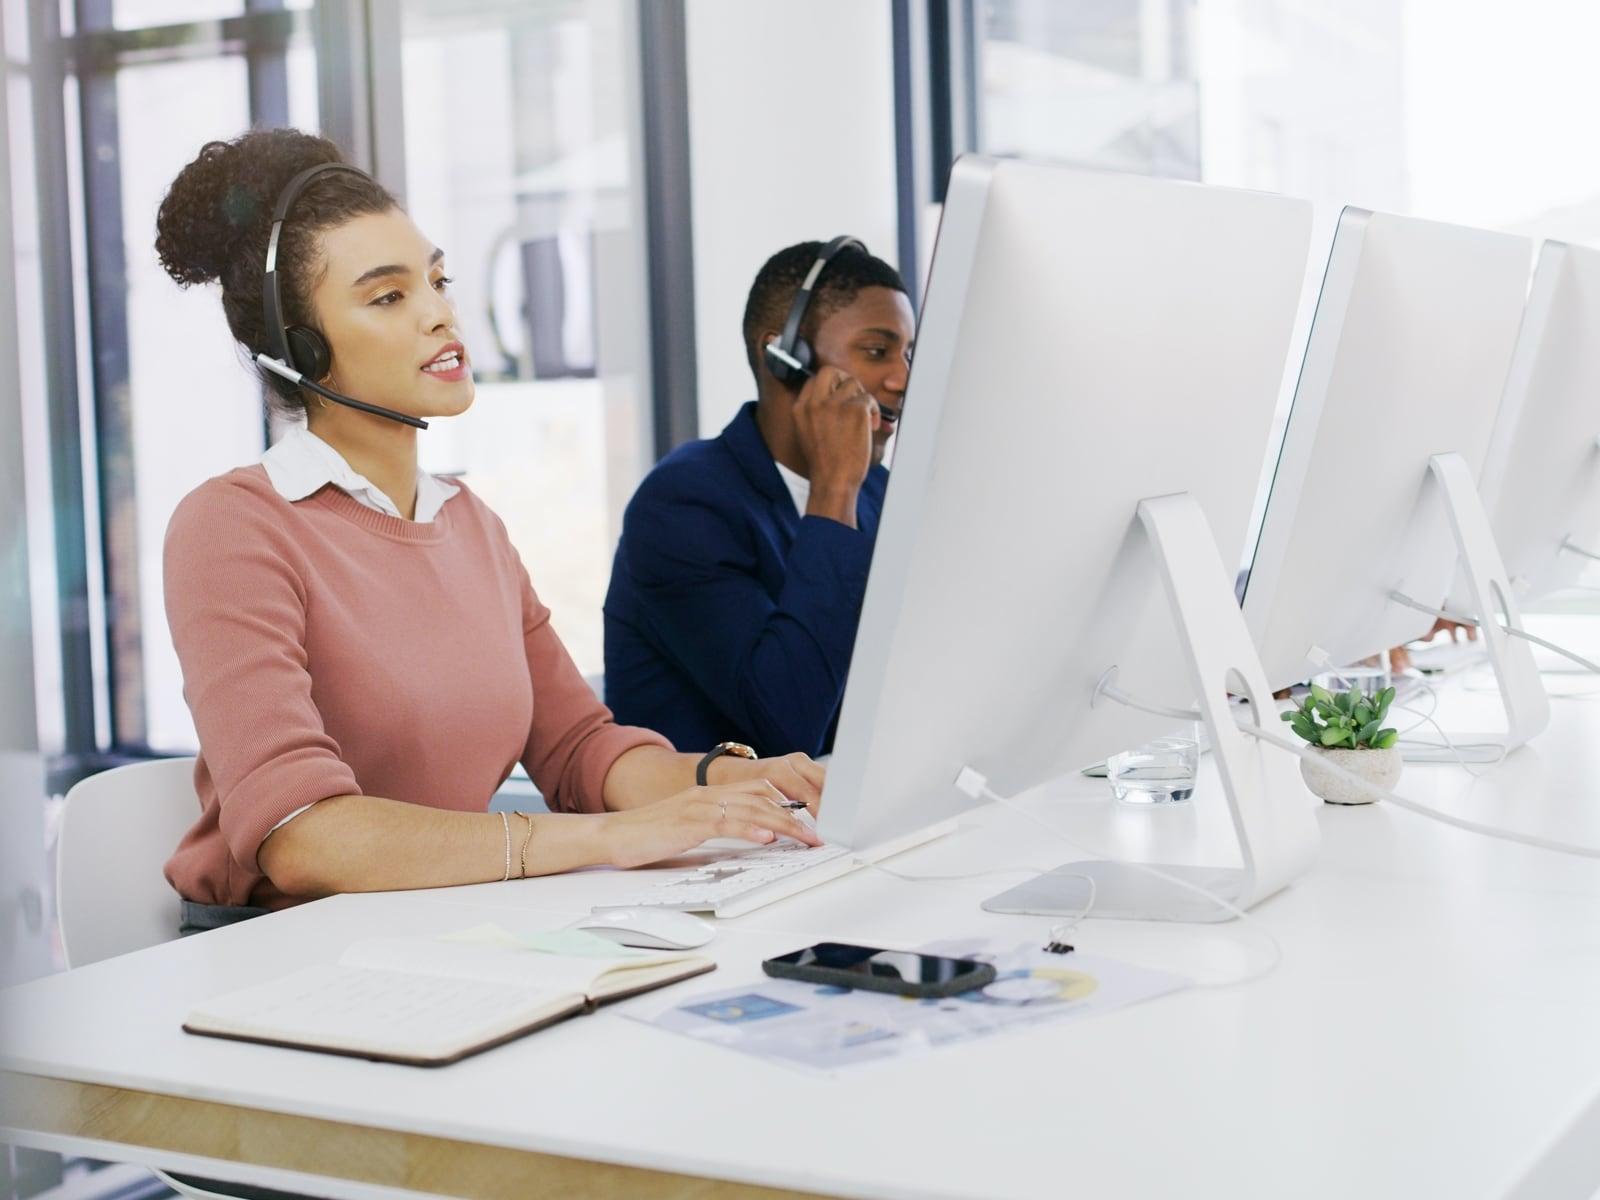 People sitting at desk answering customer calls